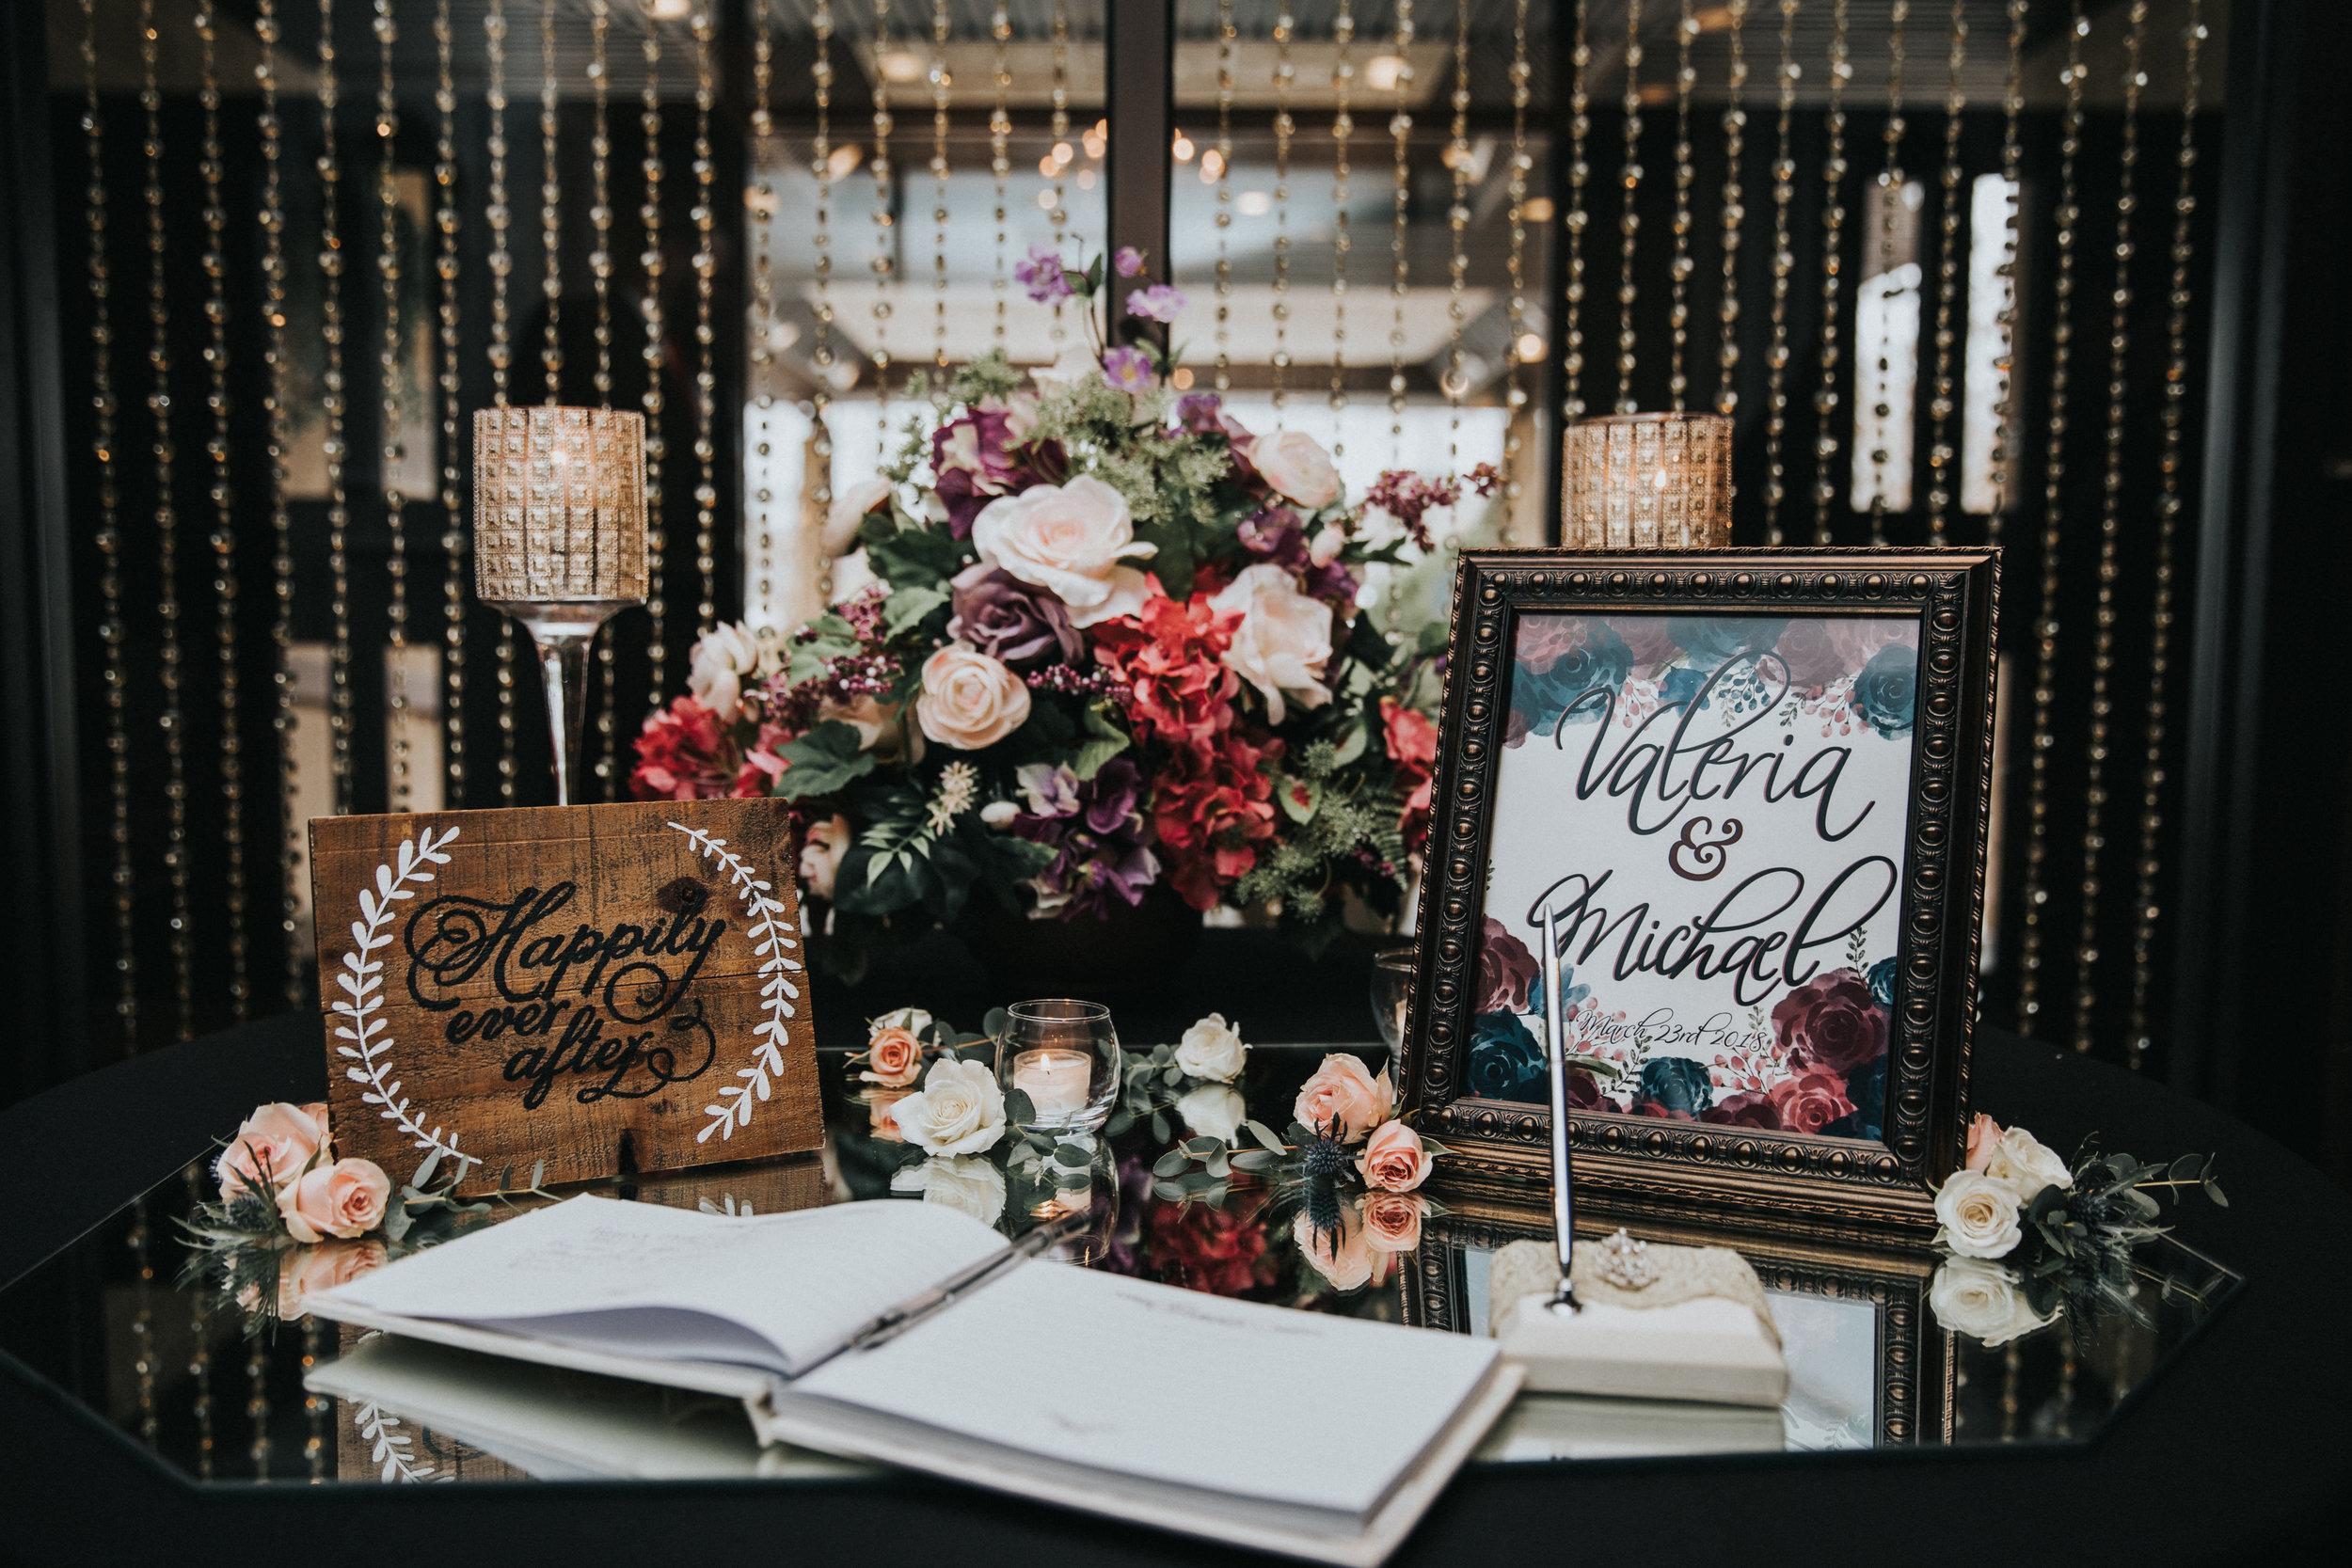 New-Jersey-Wedding-Photographer-ReceptionCenter-Valeria&Mike-Venue_Details (11 of 21).jpg